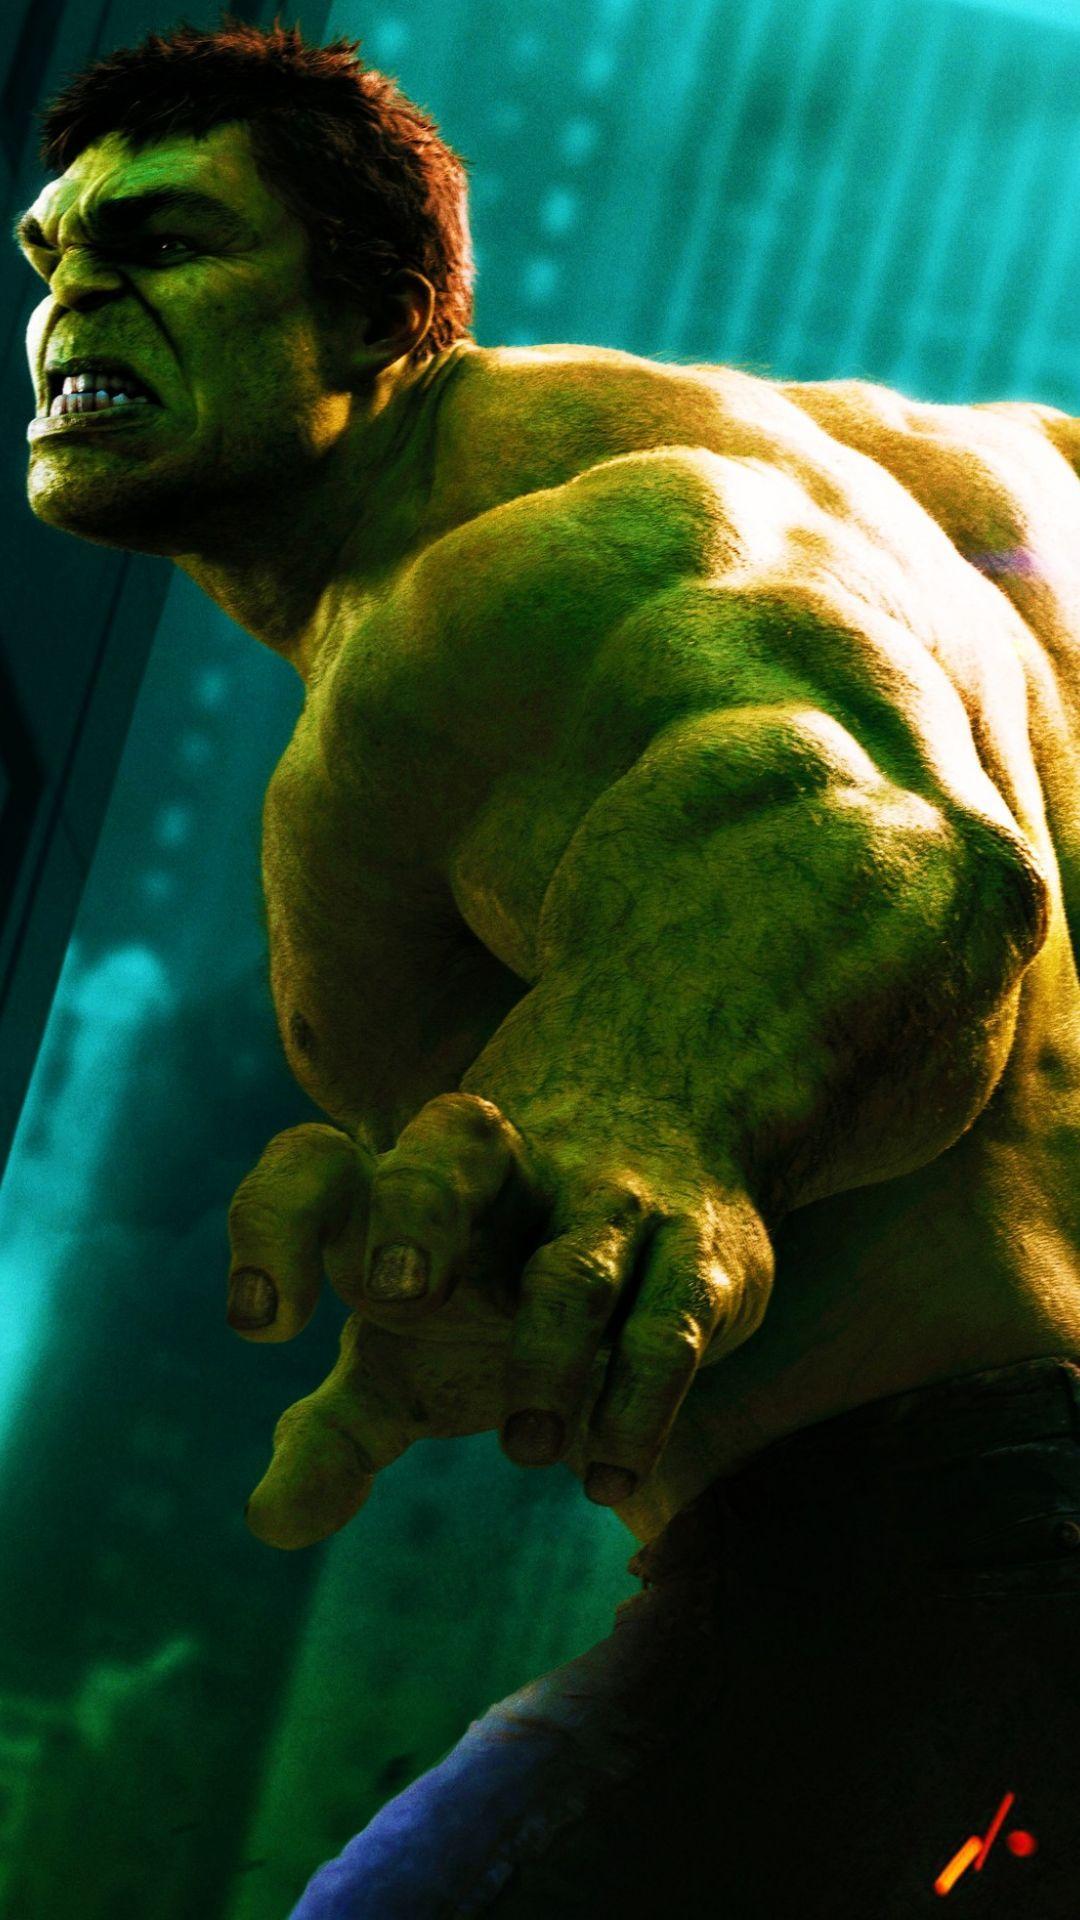 Hulk iPhone HD Wallpapers - Top Free Hulk iPhone HD ...